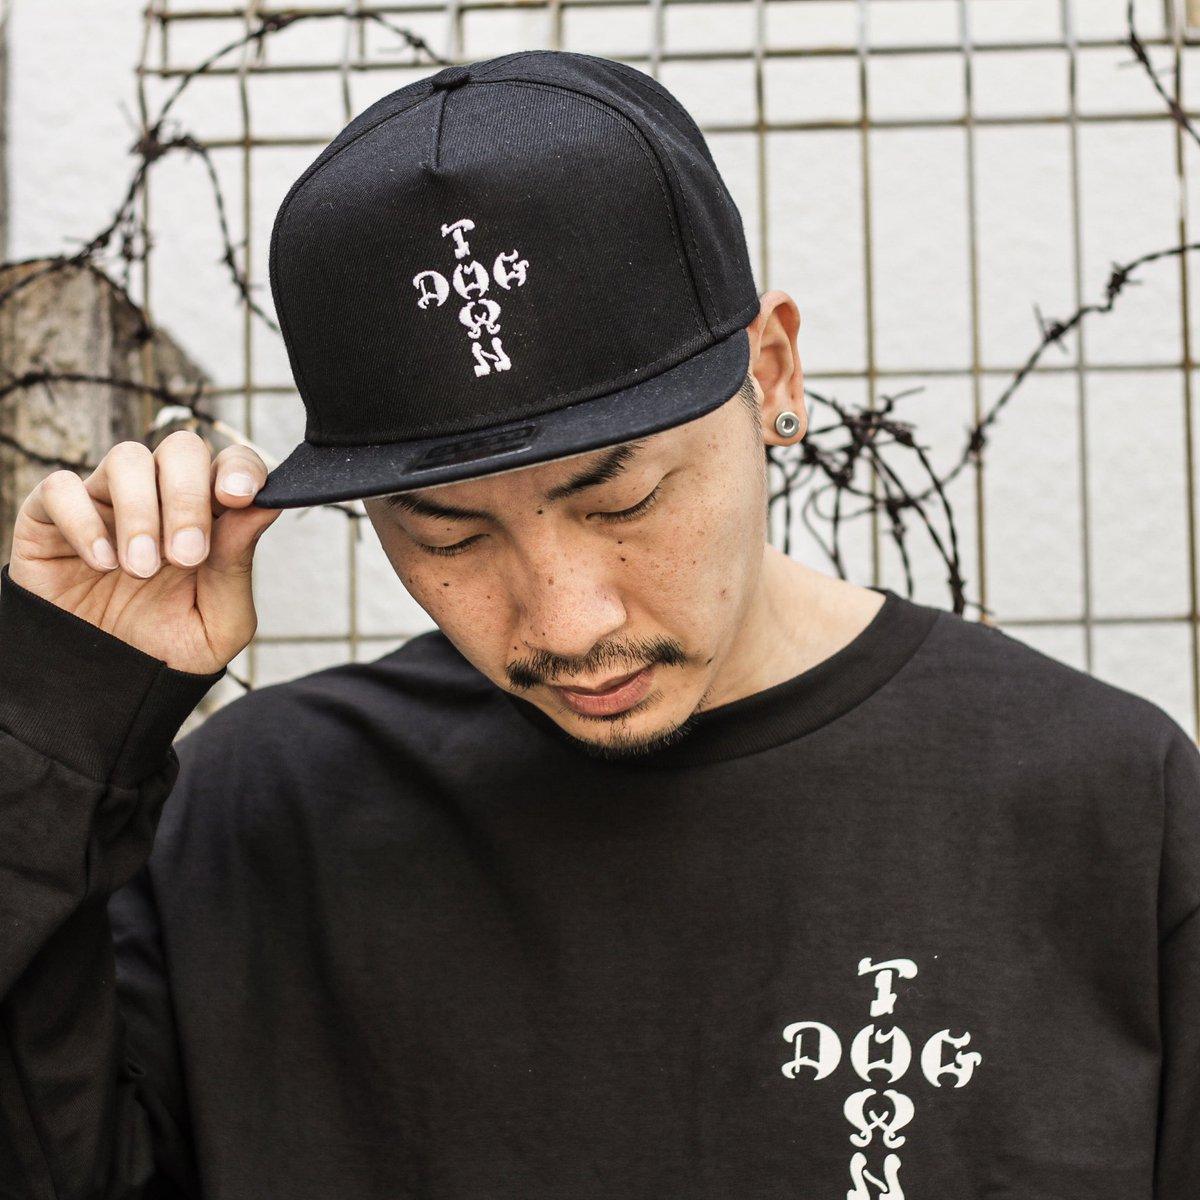 【DOGTOWN】CROSS LETTERS SNAPBACK CAP (BLACK) https://shop.feelin-osaka.com/products/detail.php?product_id=7814… フロントにロゴ刺繍が施された定番SNAPBACK。 深めでしっかり被れるOTTOボディ採用。 #dogtown #dogtownskateboards #ドッグタウン #crosslogo #logo #tee #streetwear #streetstyle #streetfashion #fashion #feelinosakapic.twitter.com/CrLMLz6MRM